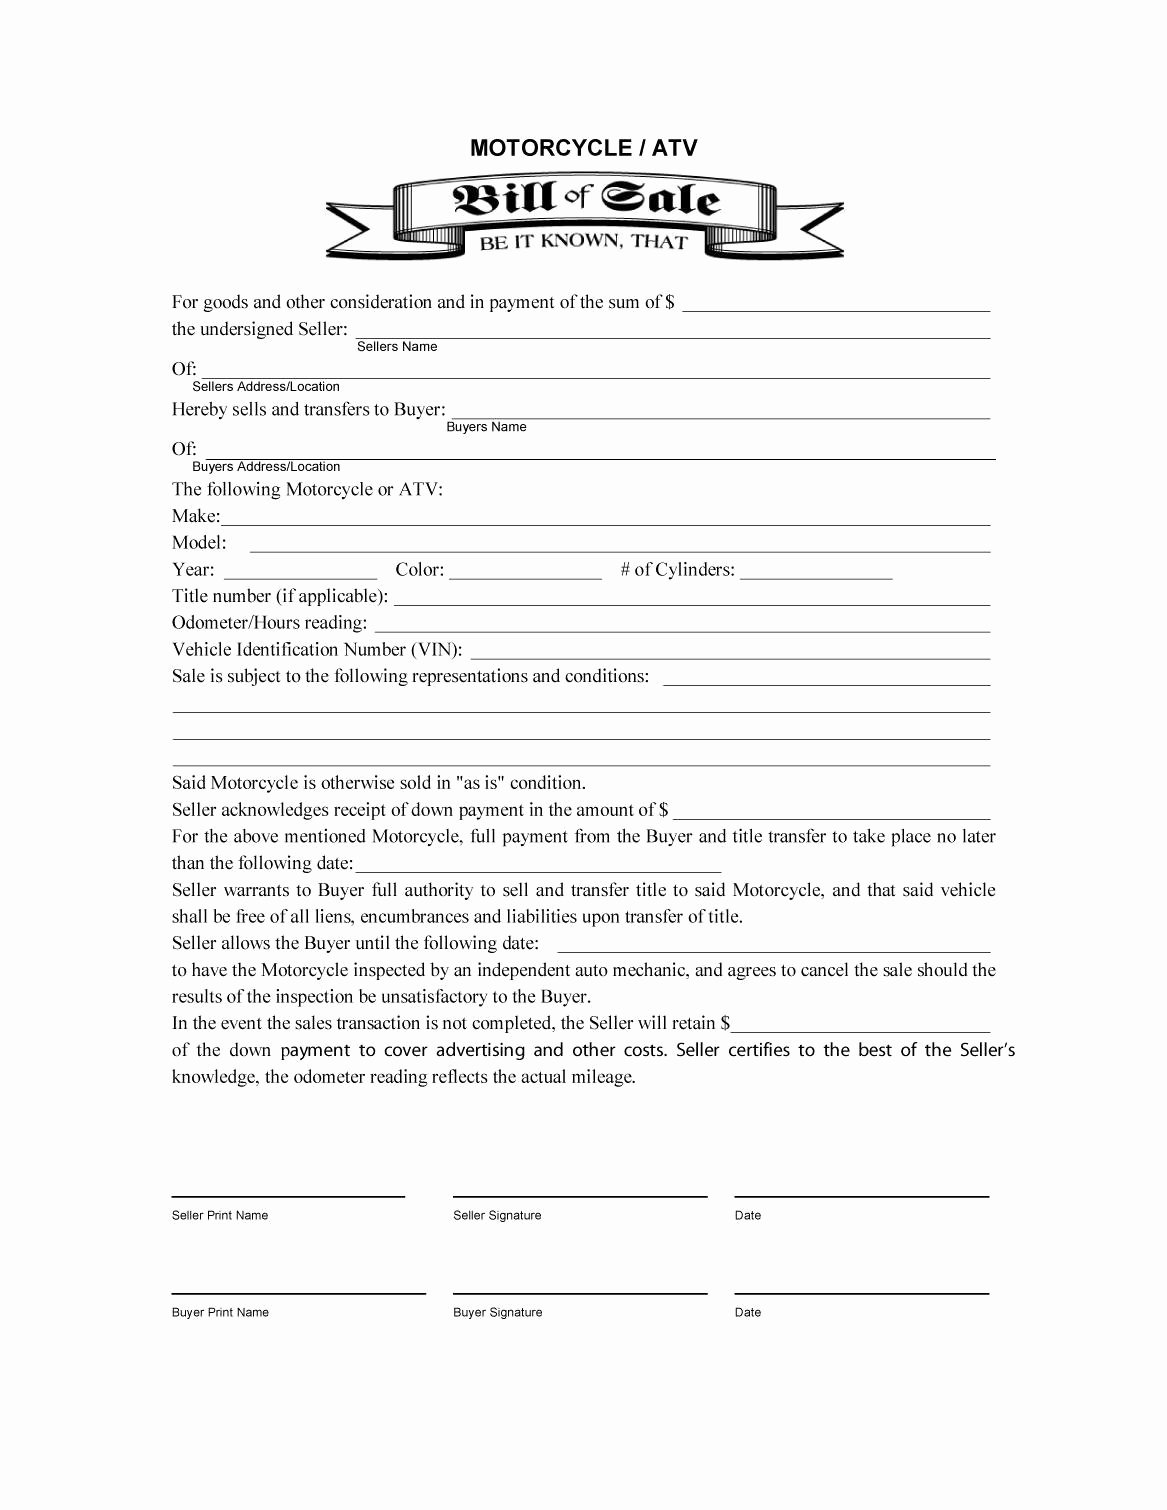 Bill Of Sale Motorcycle Pdf Elegant 45 Fee Printable Bill Of Sale Templates Car Boat Gun